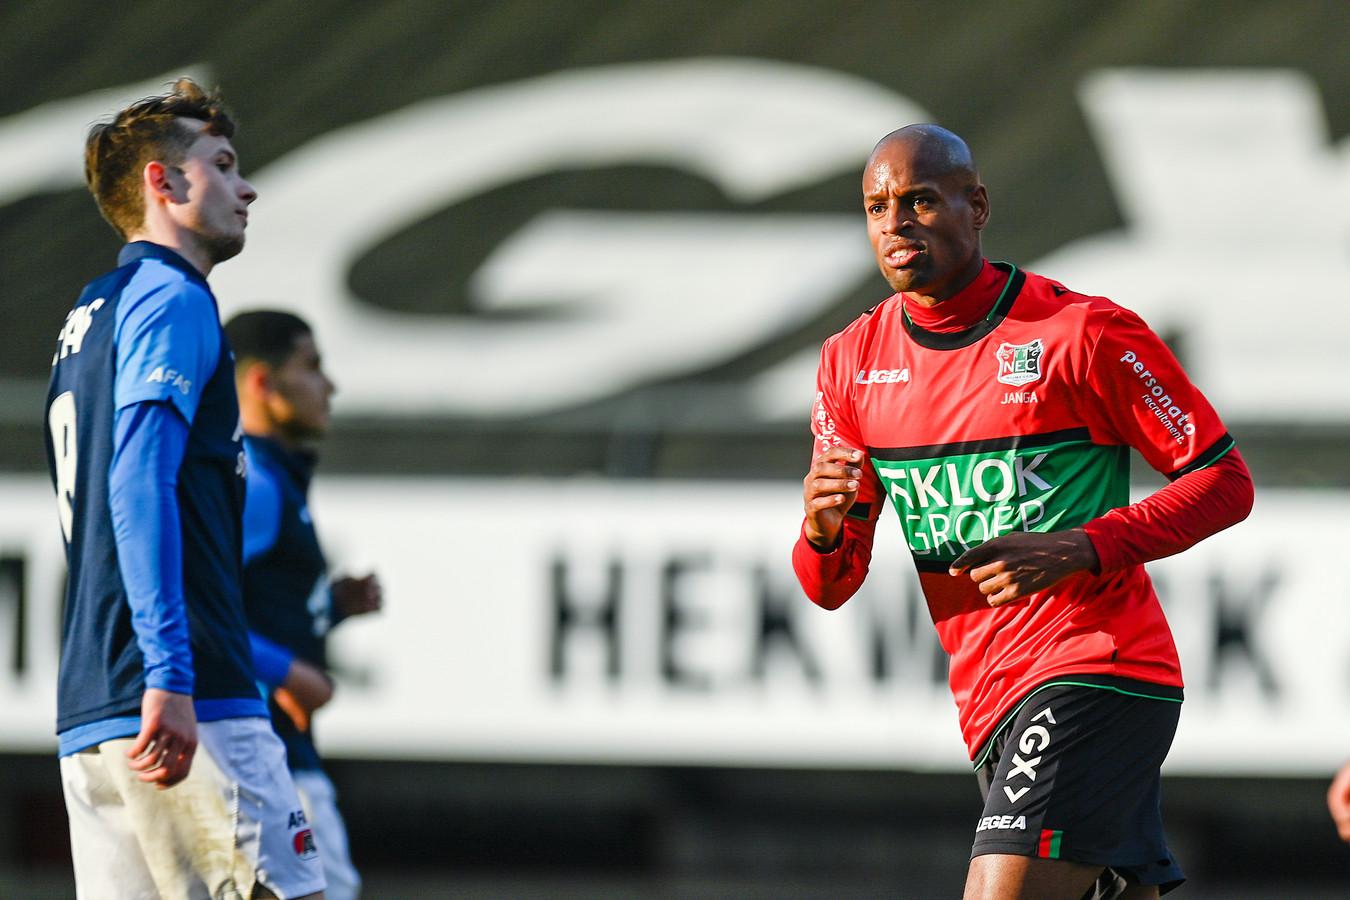 NEC-spits Rangelo Janga juicht na zijn treffer tegen Jong AZ.